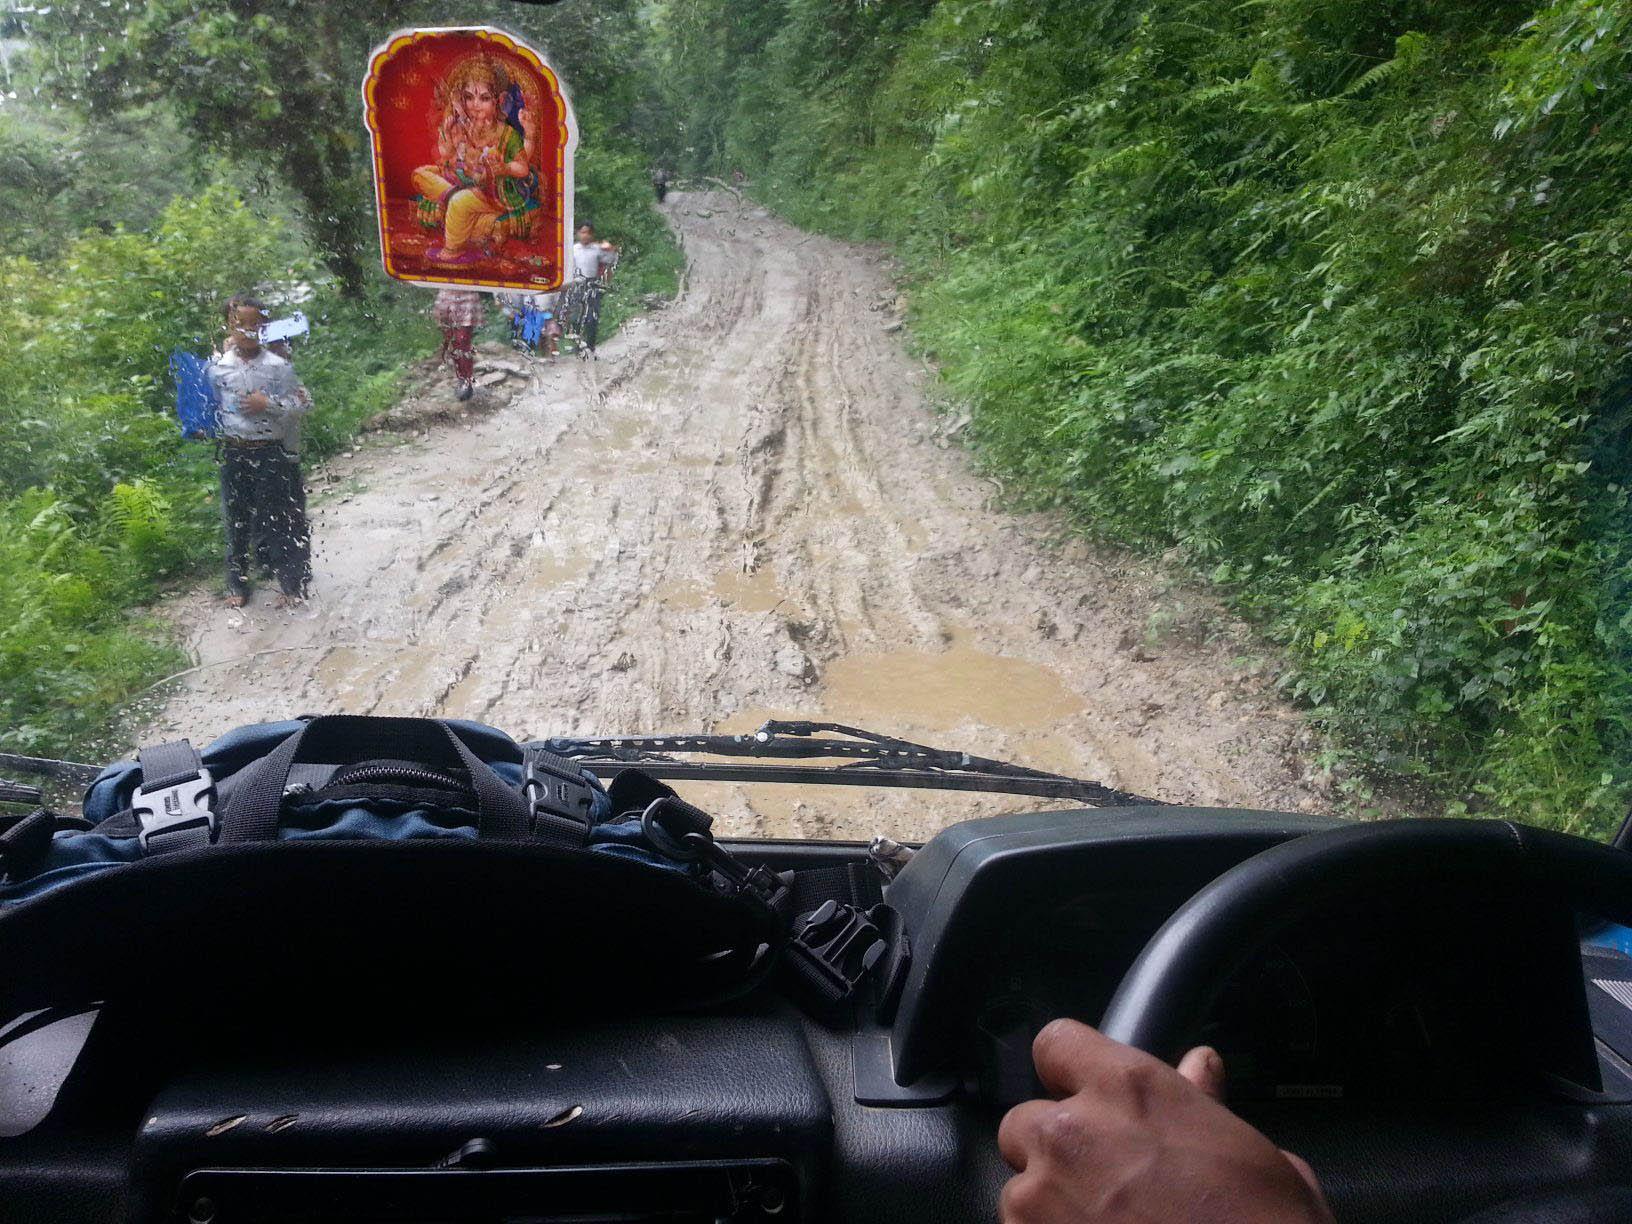 B_108c_20_road_condition.jpg